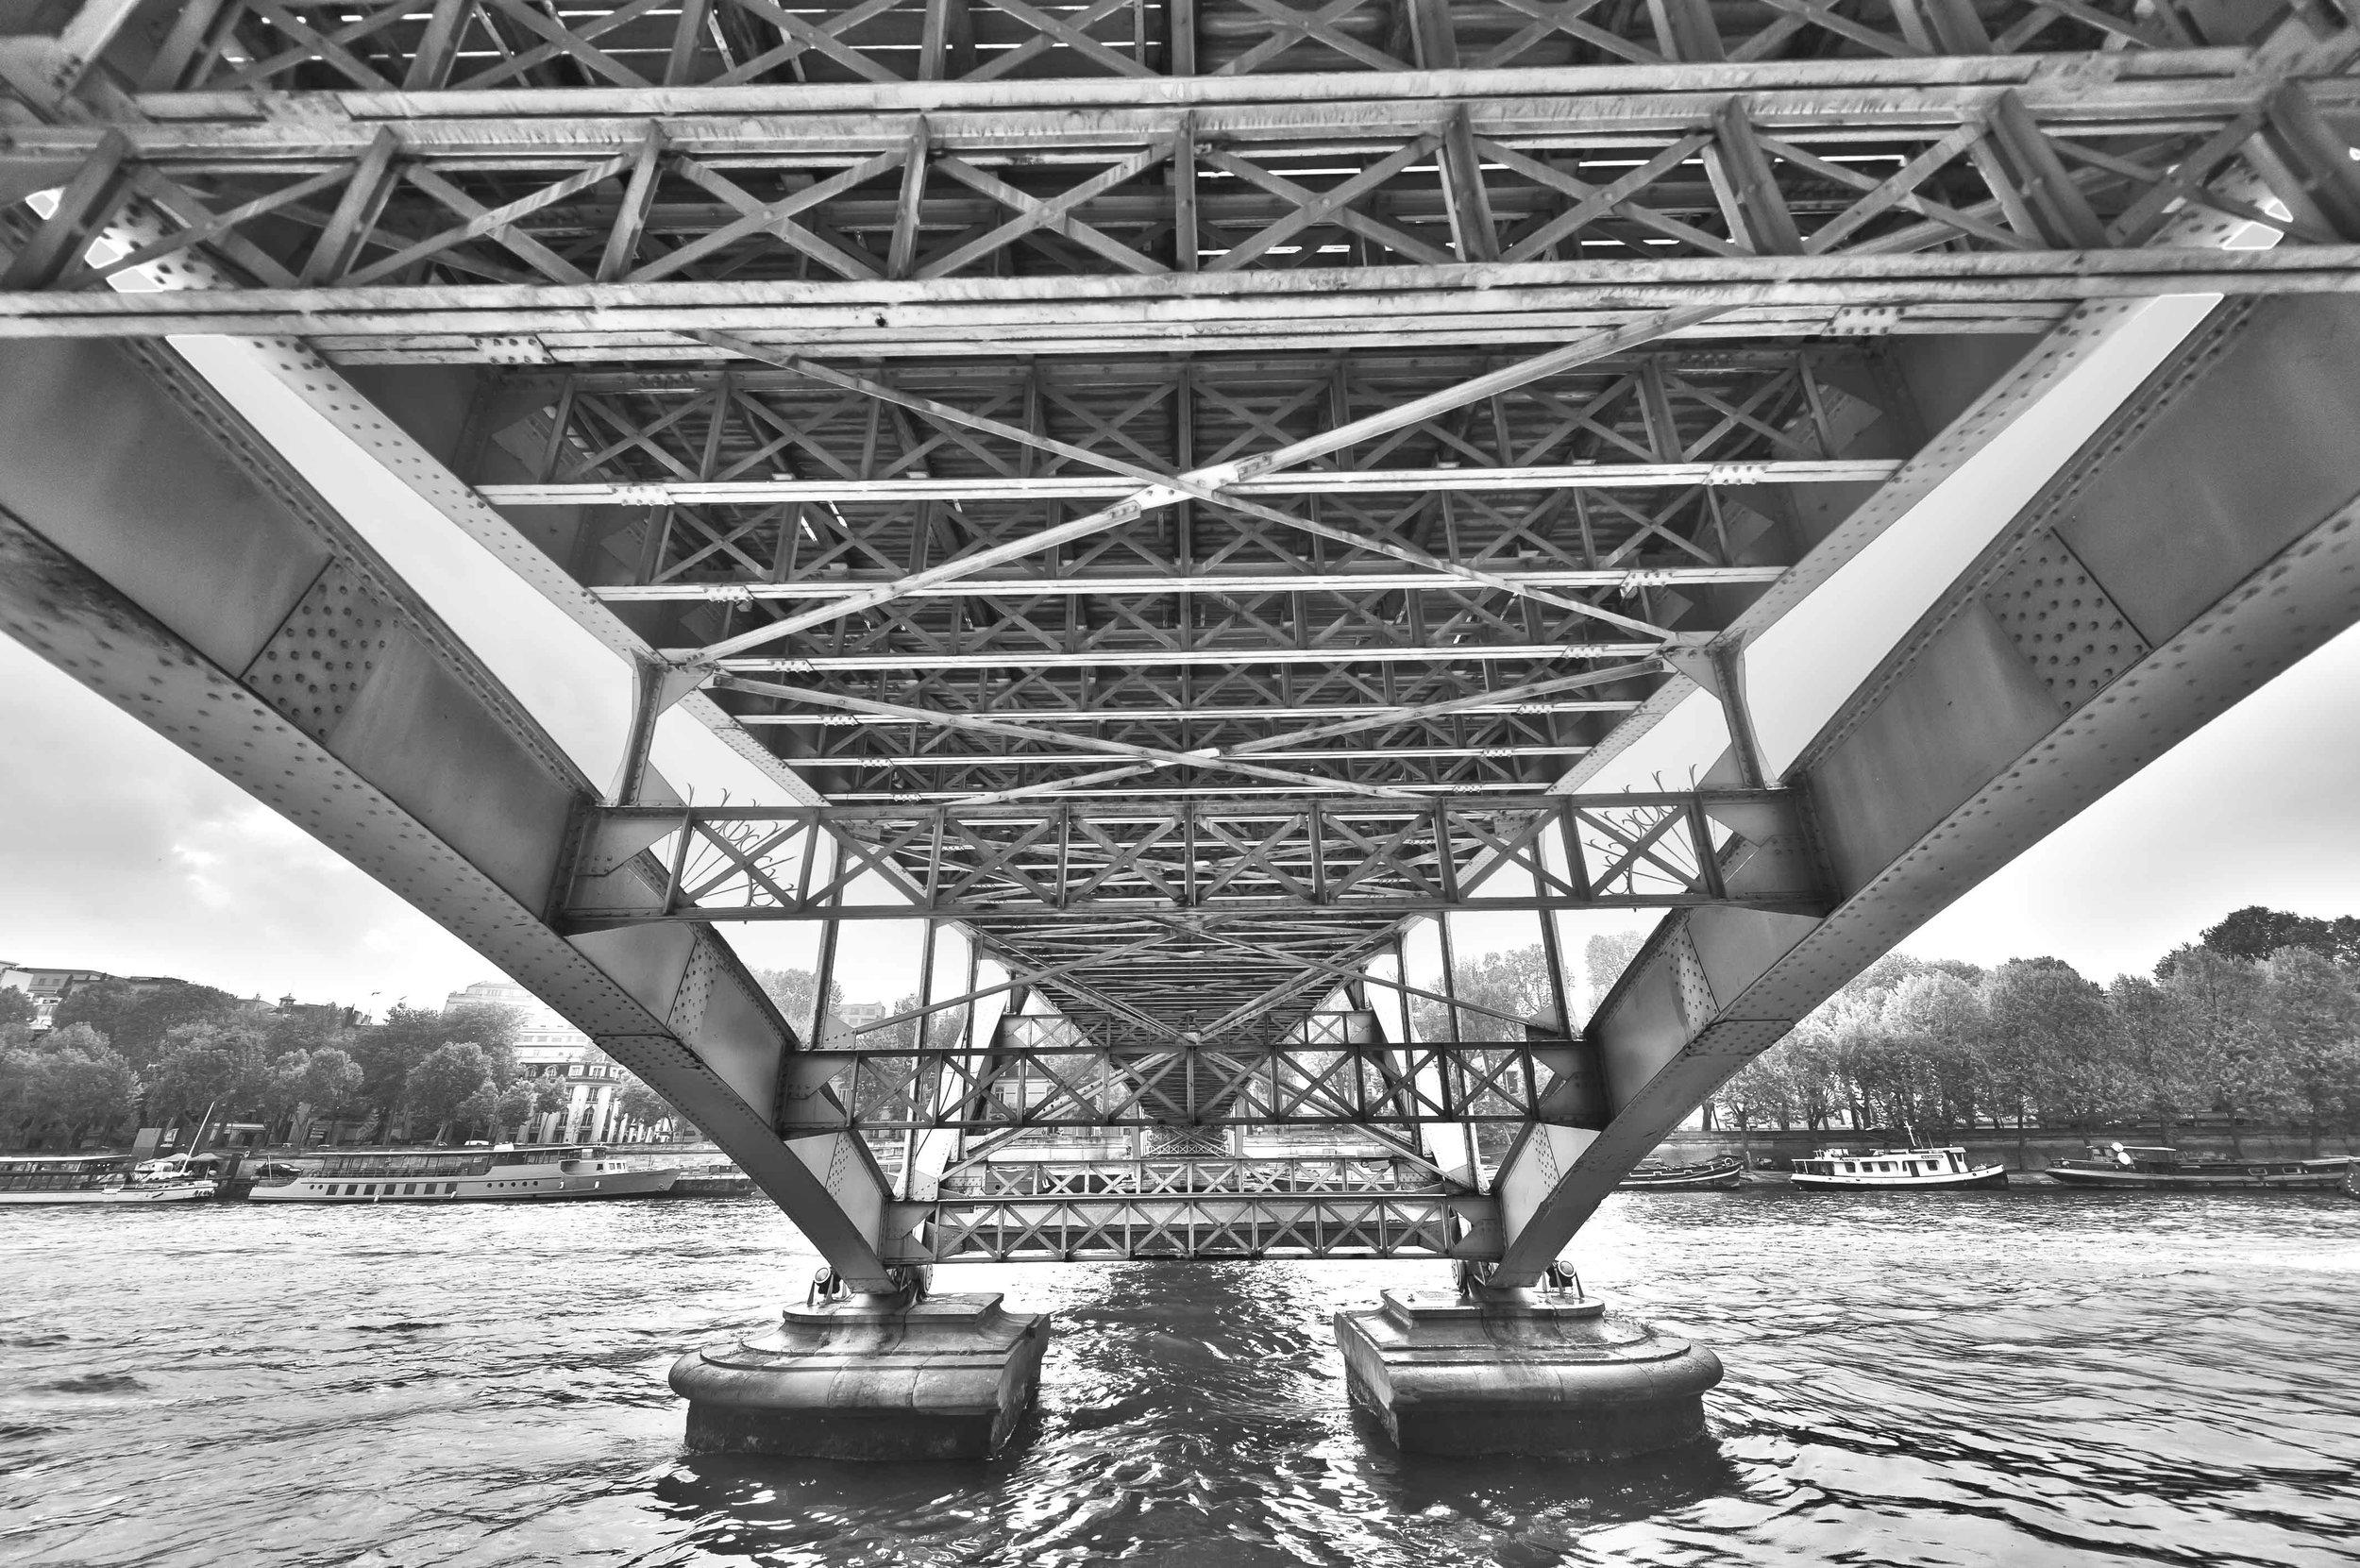 Paris_Nikon_20170504_001.jpg